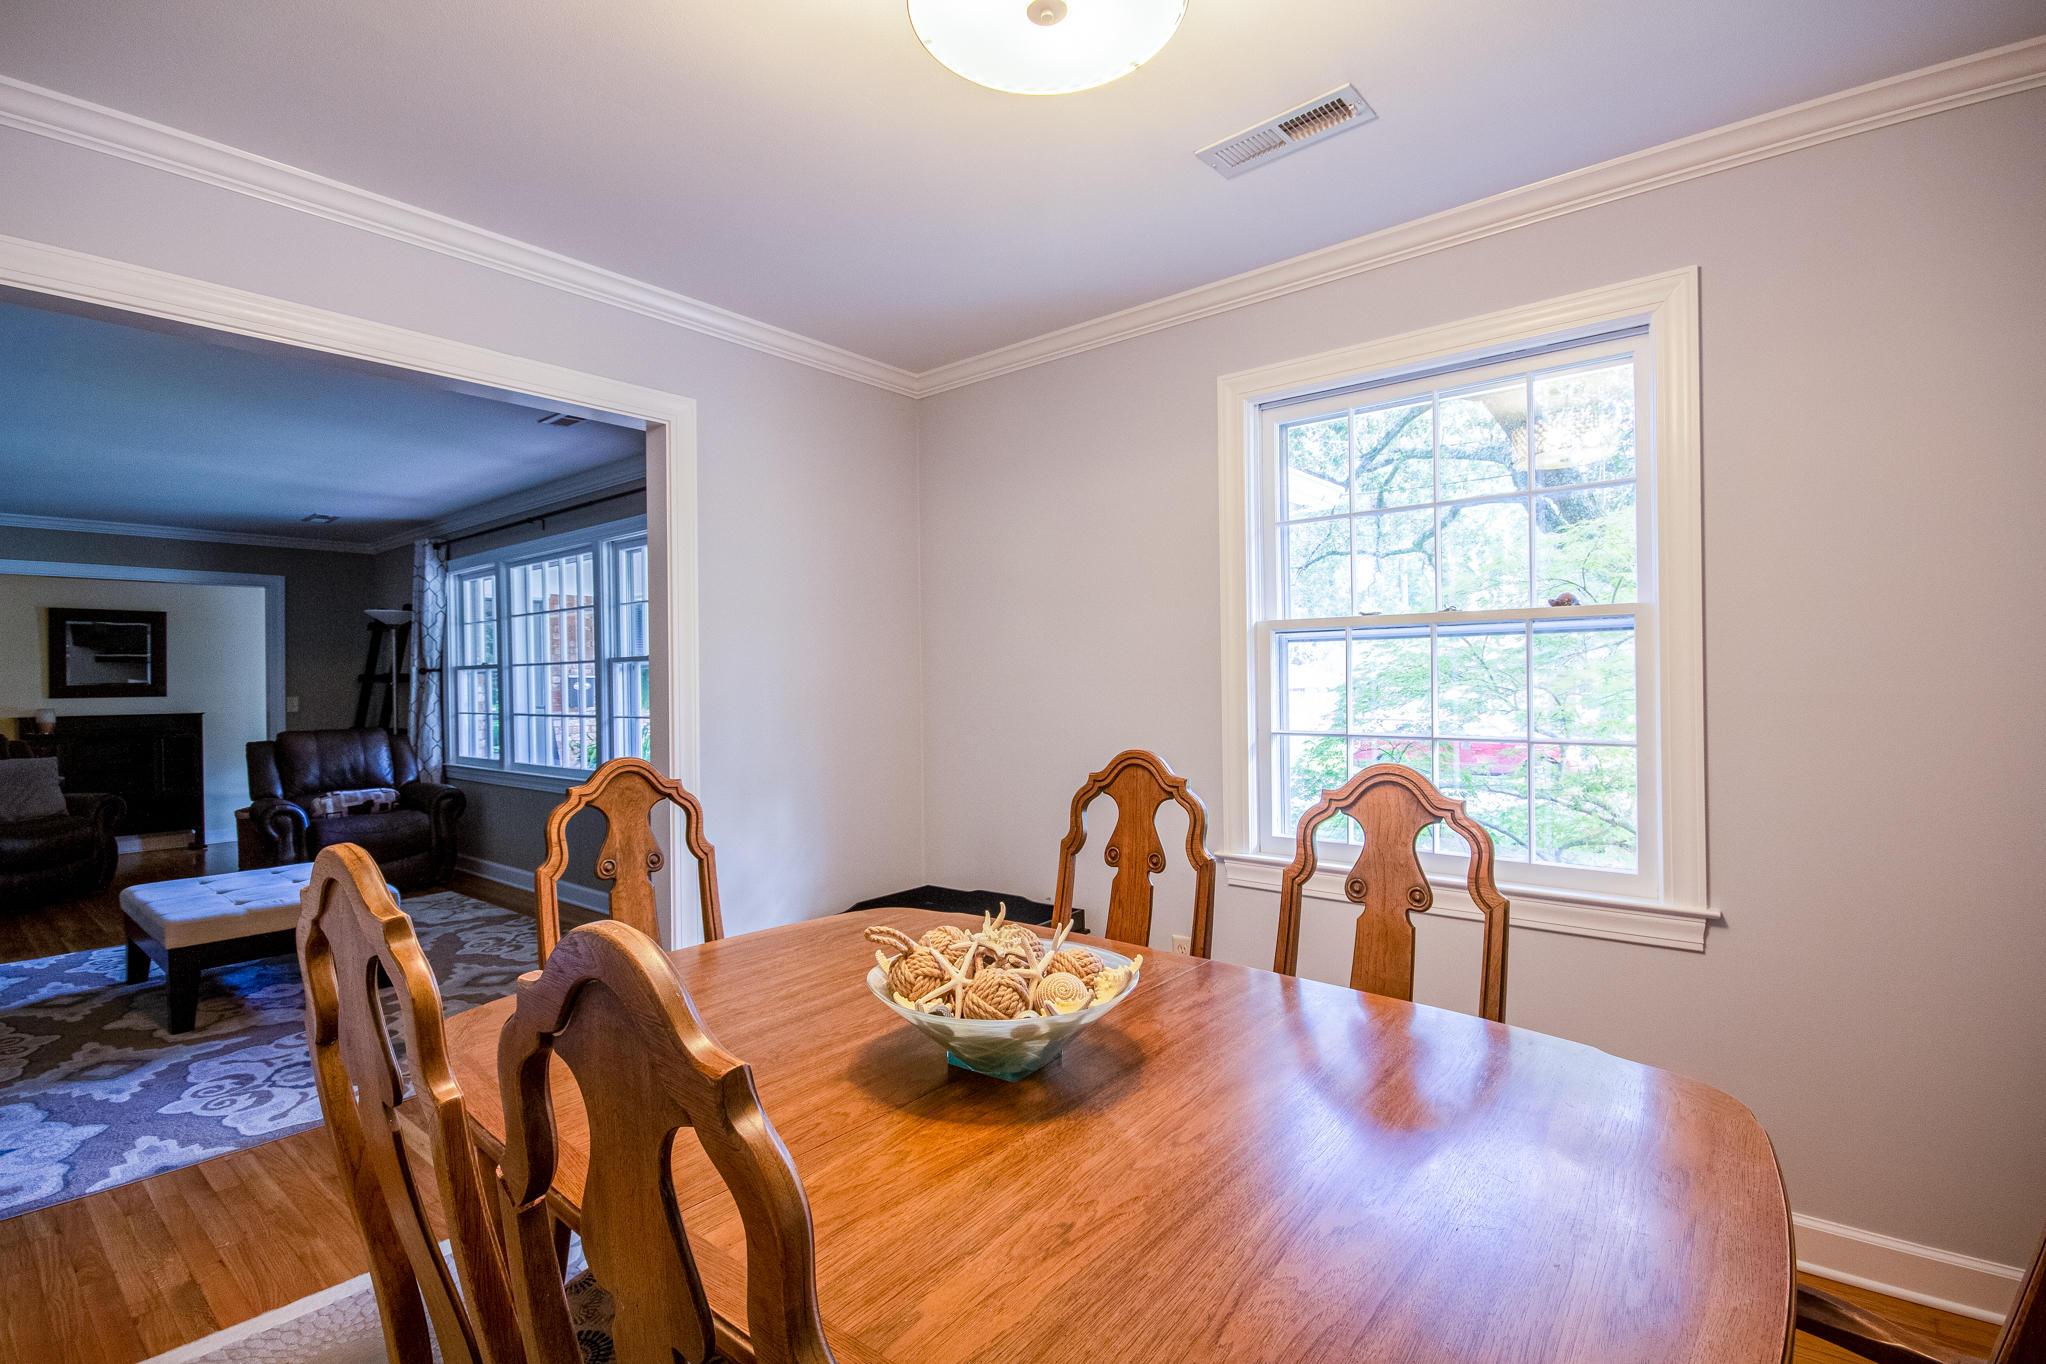 Belvedere Estates Homes For Sale - 6021 Rembert, Hanahan, SC - 1